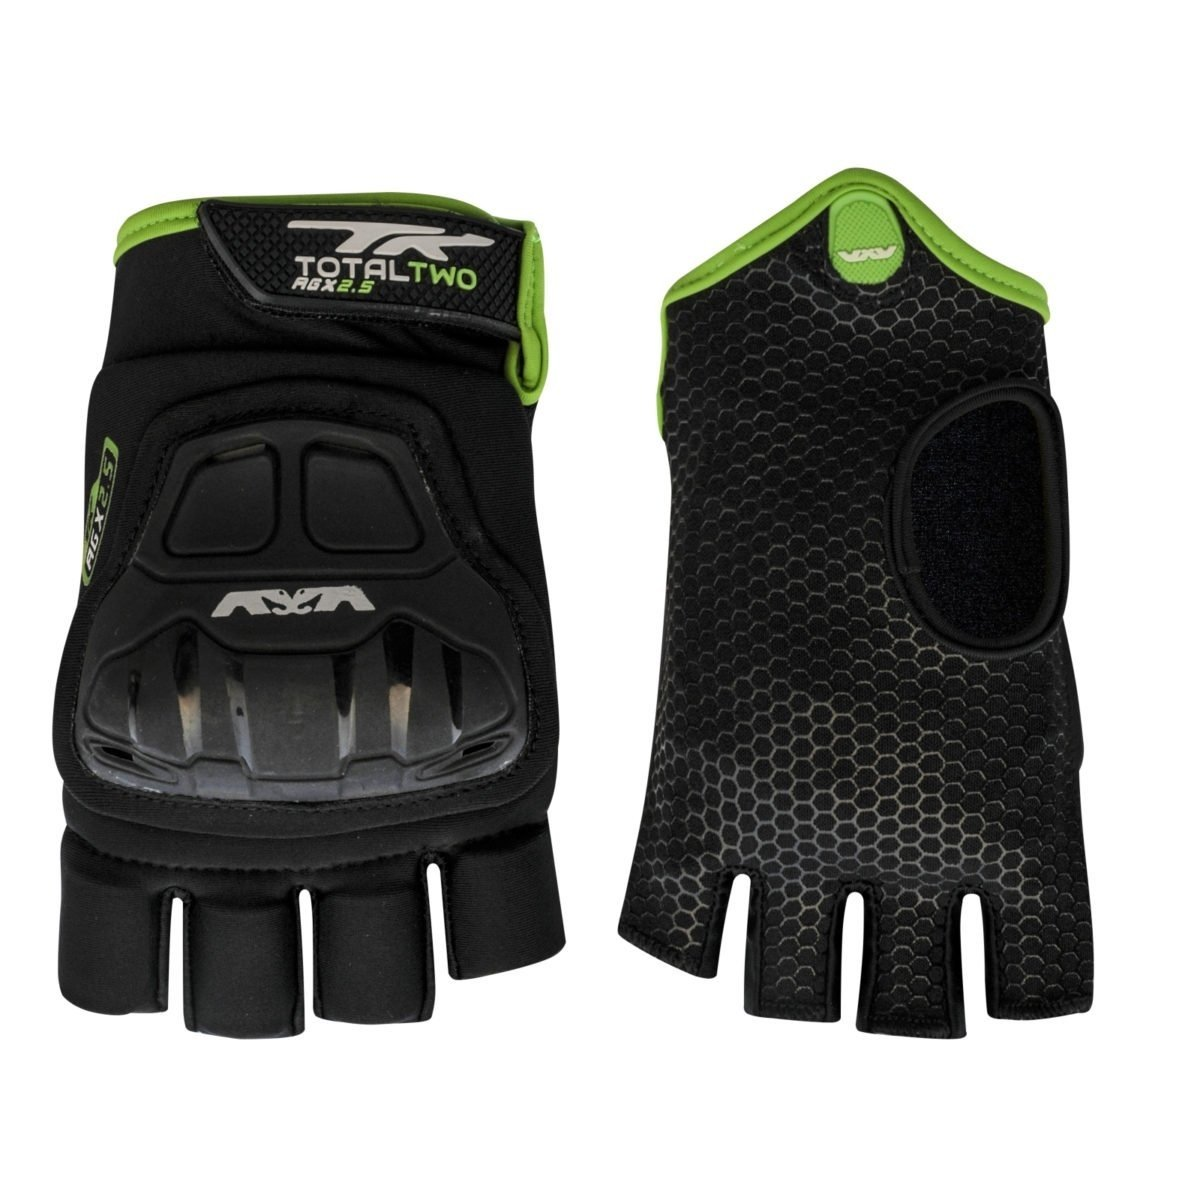 2017/18 TK Total One AGX 2.5 Hockey Glove with palm